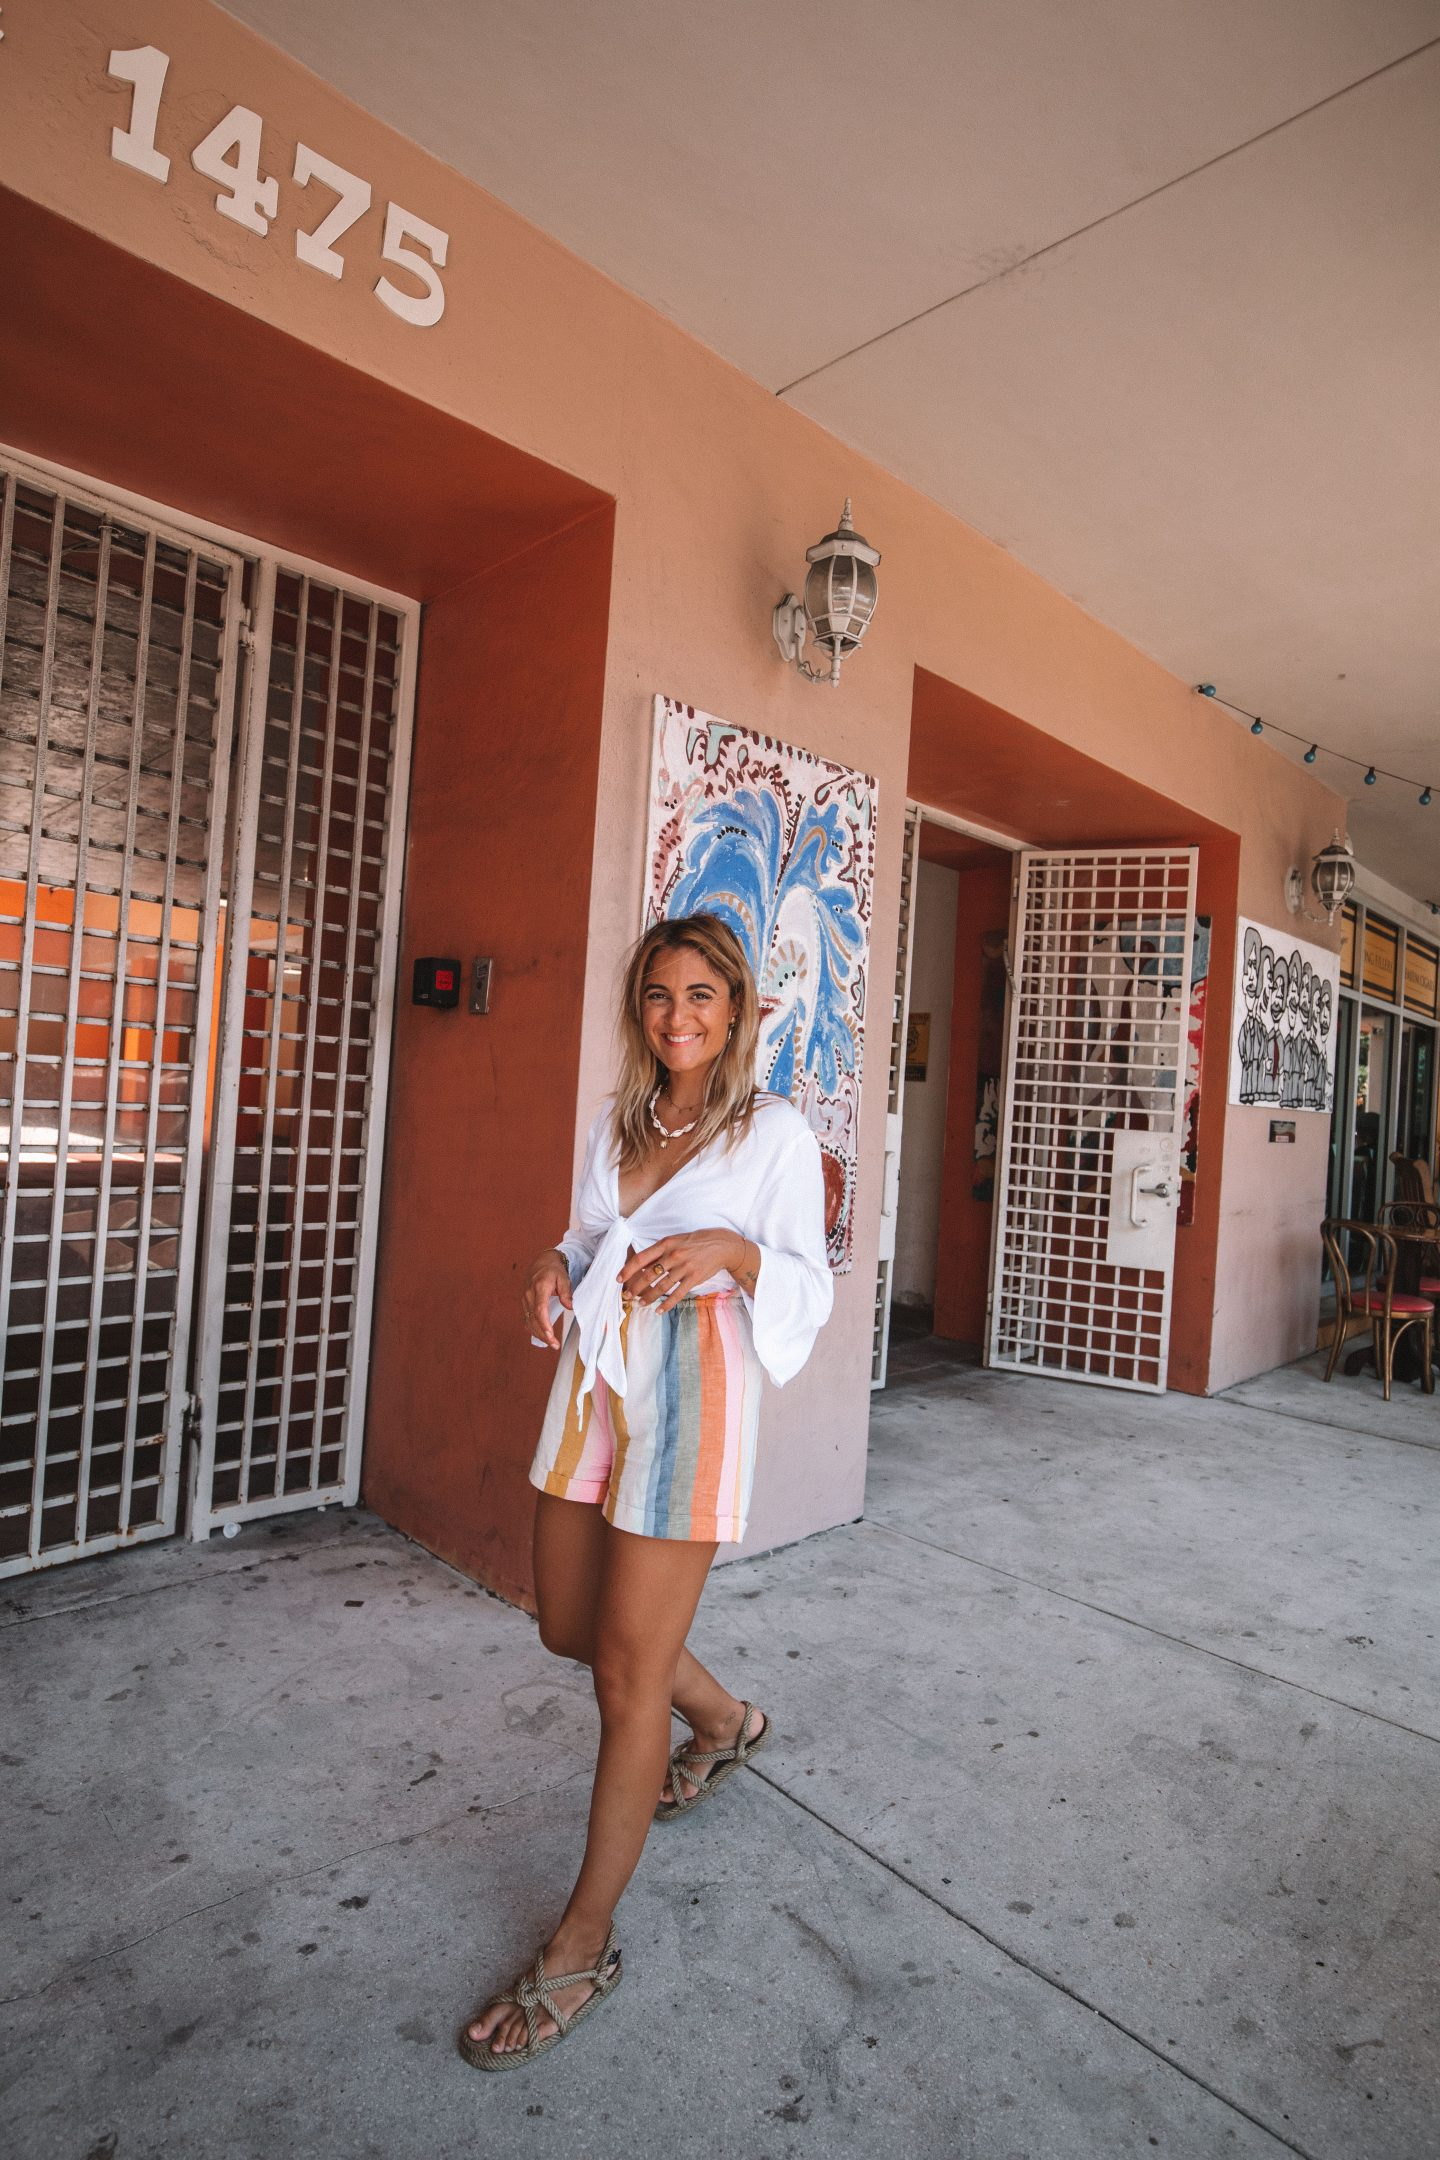 Guide de voyage Miami - Blondie Baby blog mode et voyages